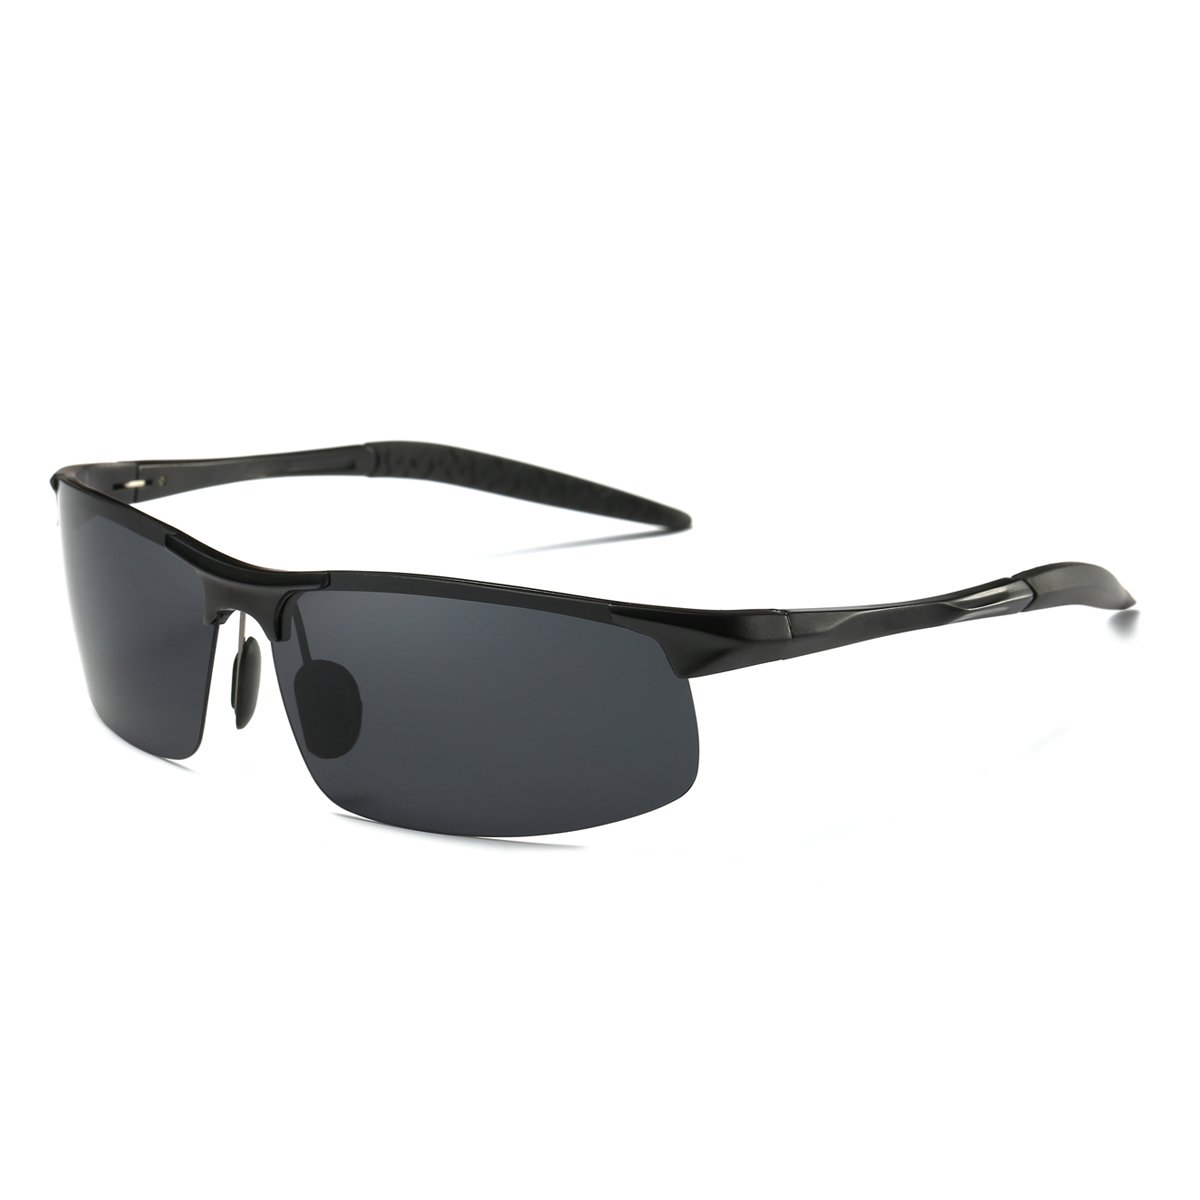 ELITERA Deporte Gafas de sol Hombre Aleación de magnesio de aluminio E8177